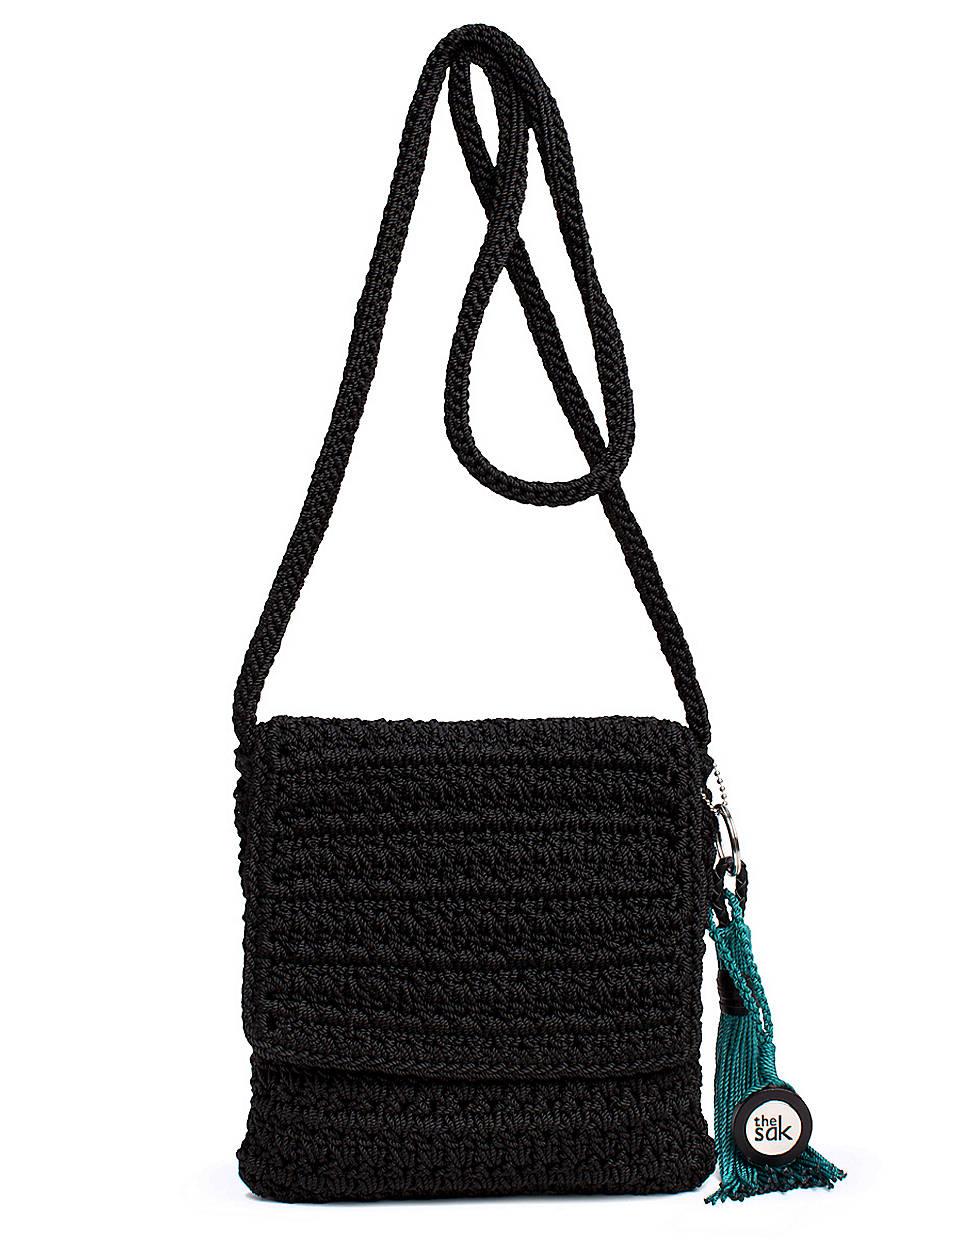 The Sak Crochet Purse Black Best Purse Image Ccdbborg